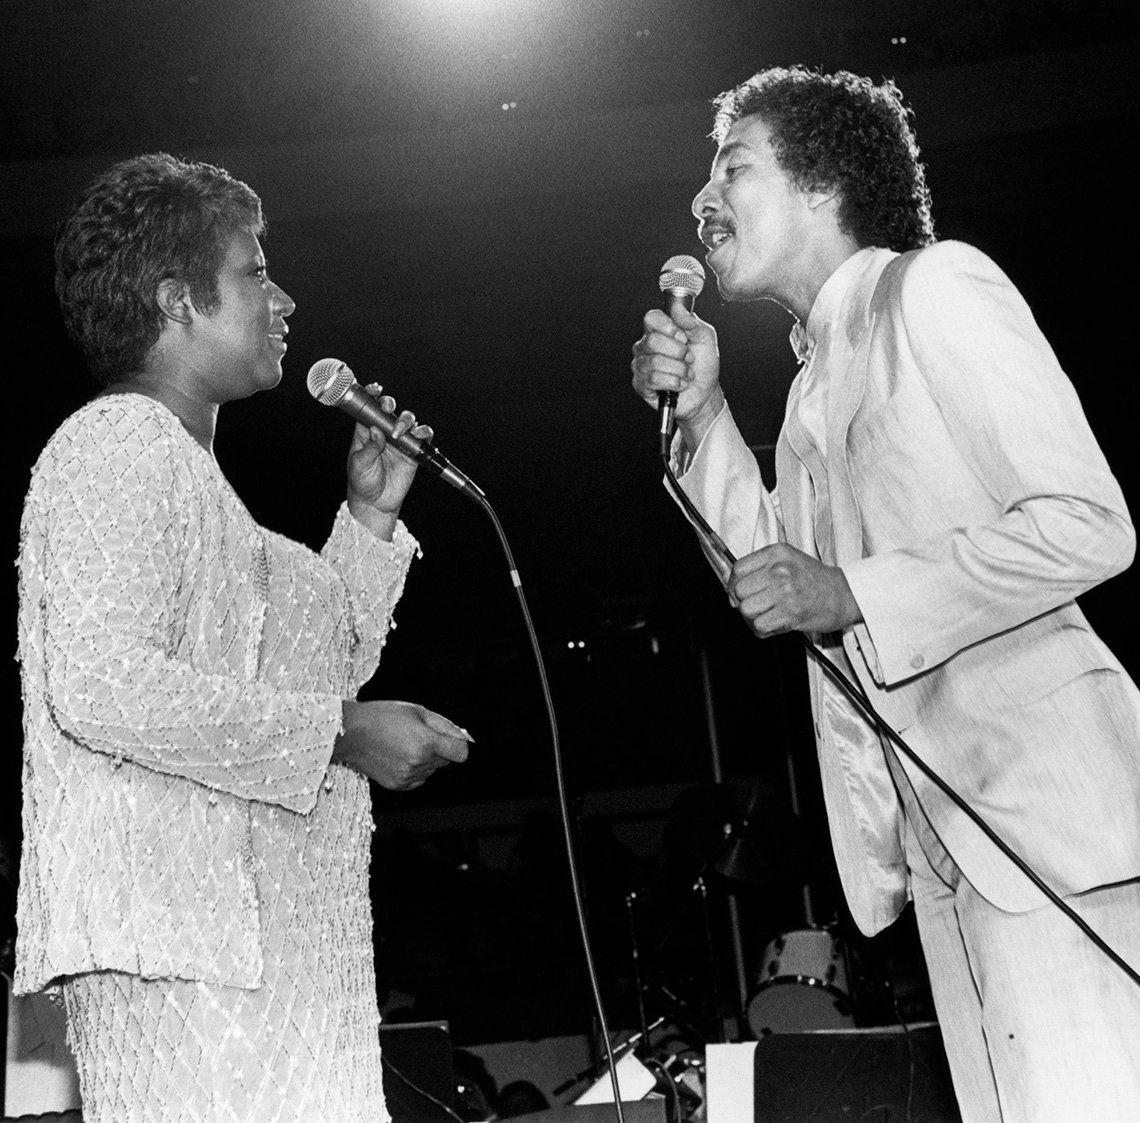 Aretha Franklin cantando con Smokey Robinson en un escenario.